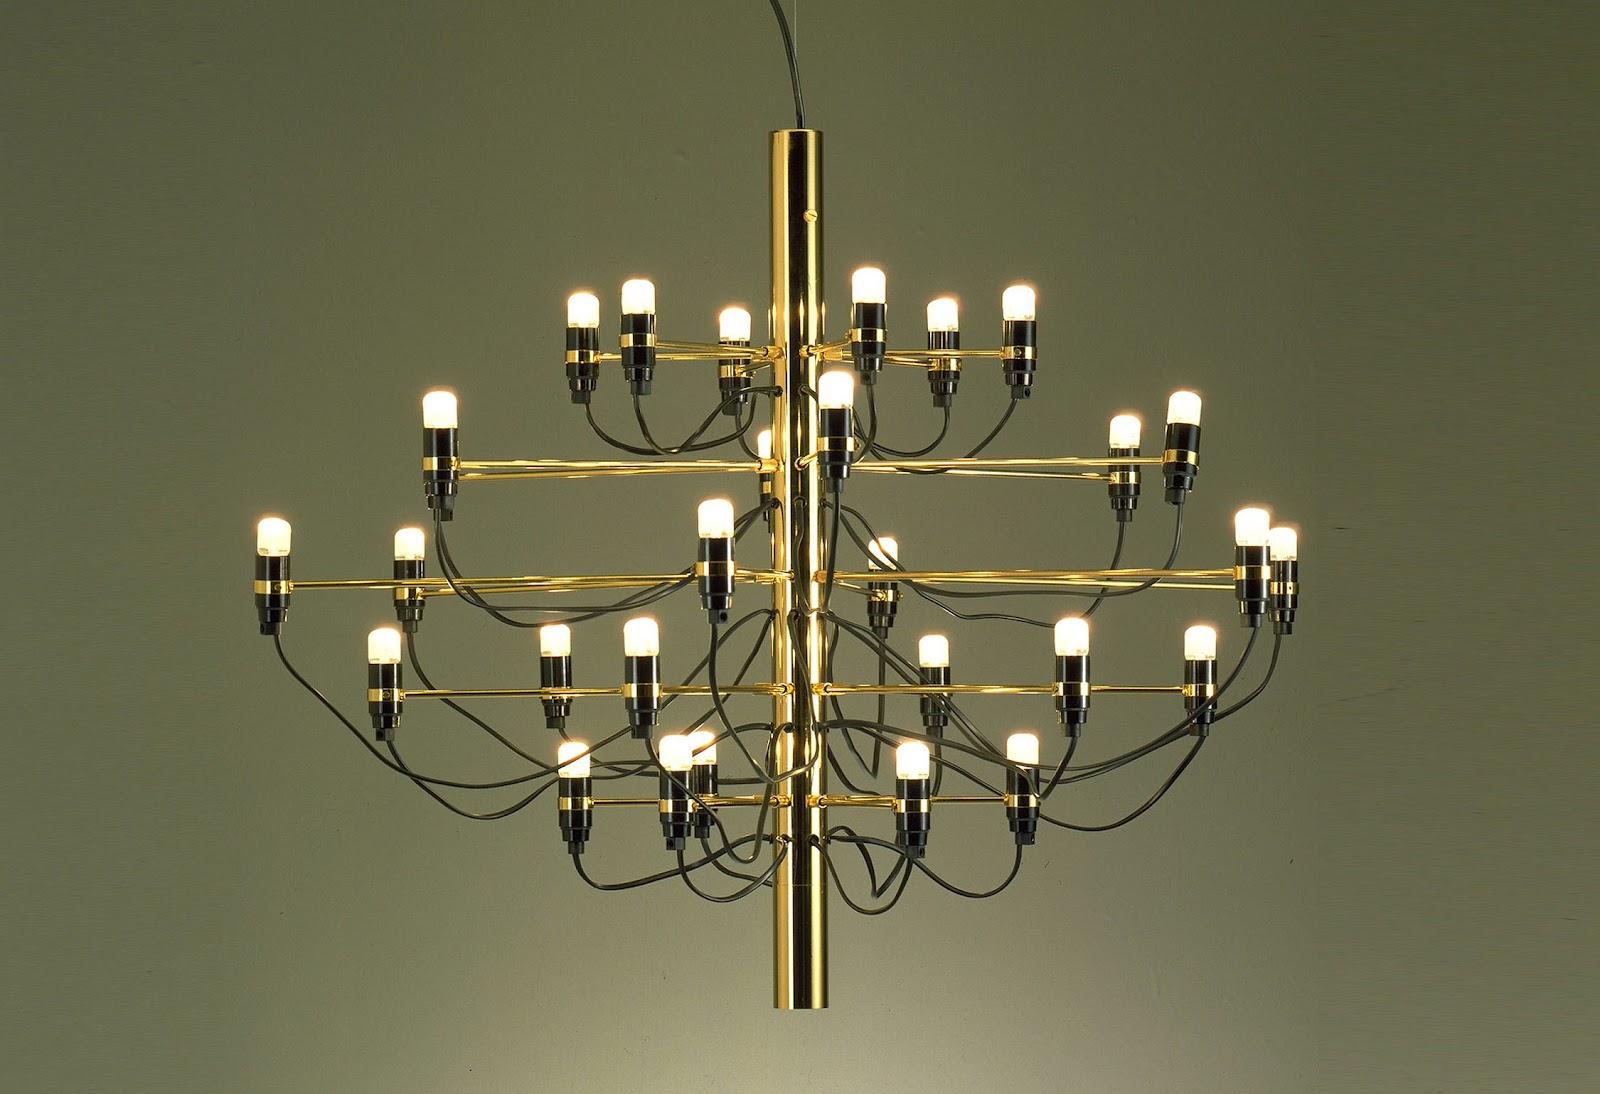 Gino sarfatti lighting modern design by - Designer lights ...